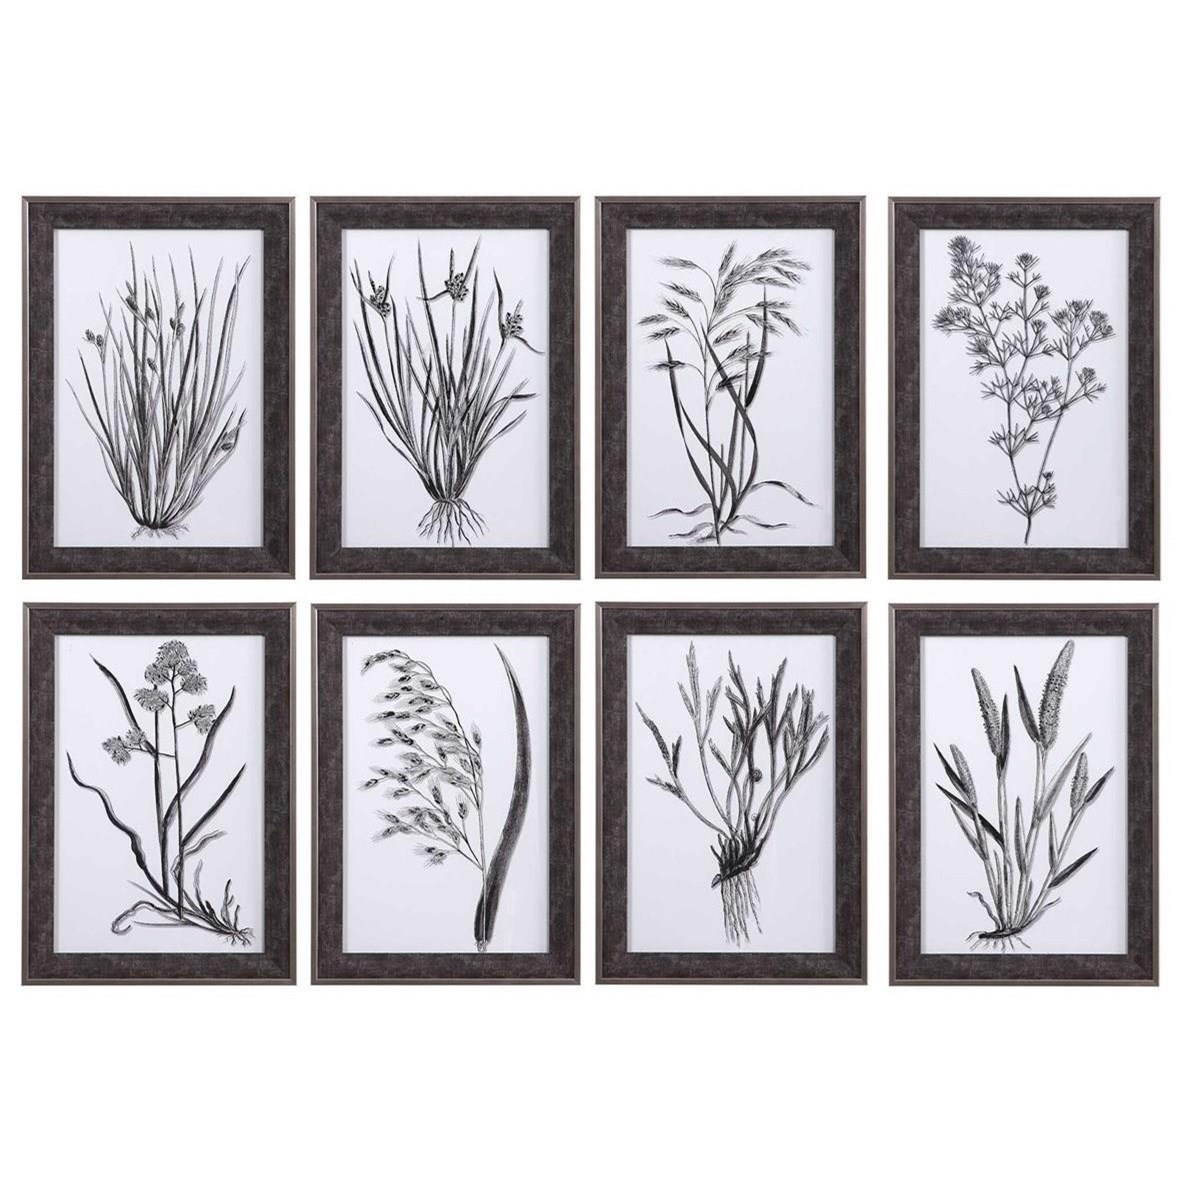 Art Classic Botany Framed Prints, Set/8 by Uttermost at Mueller Furniture